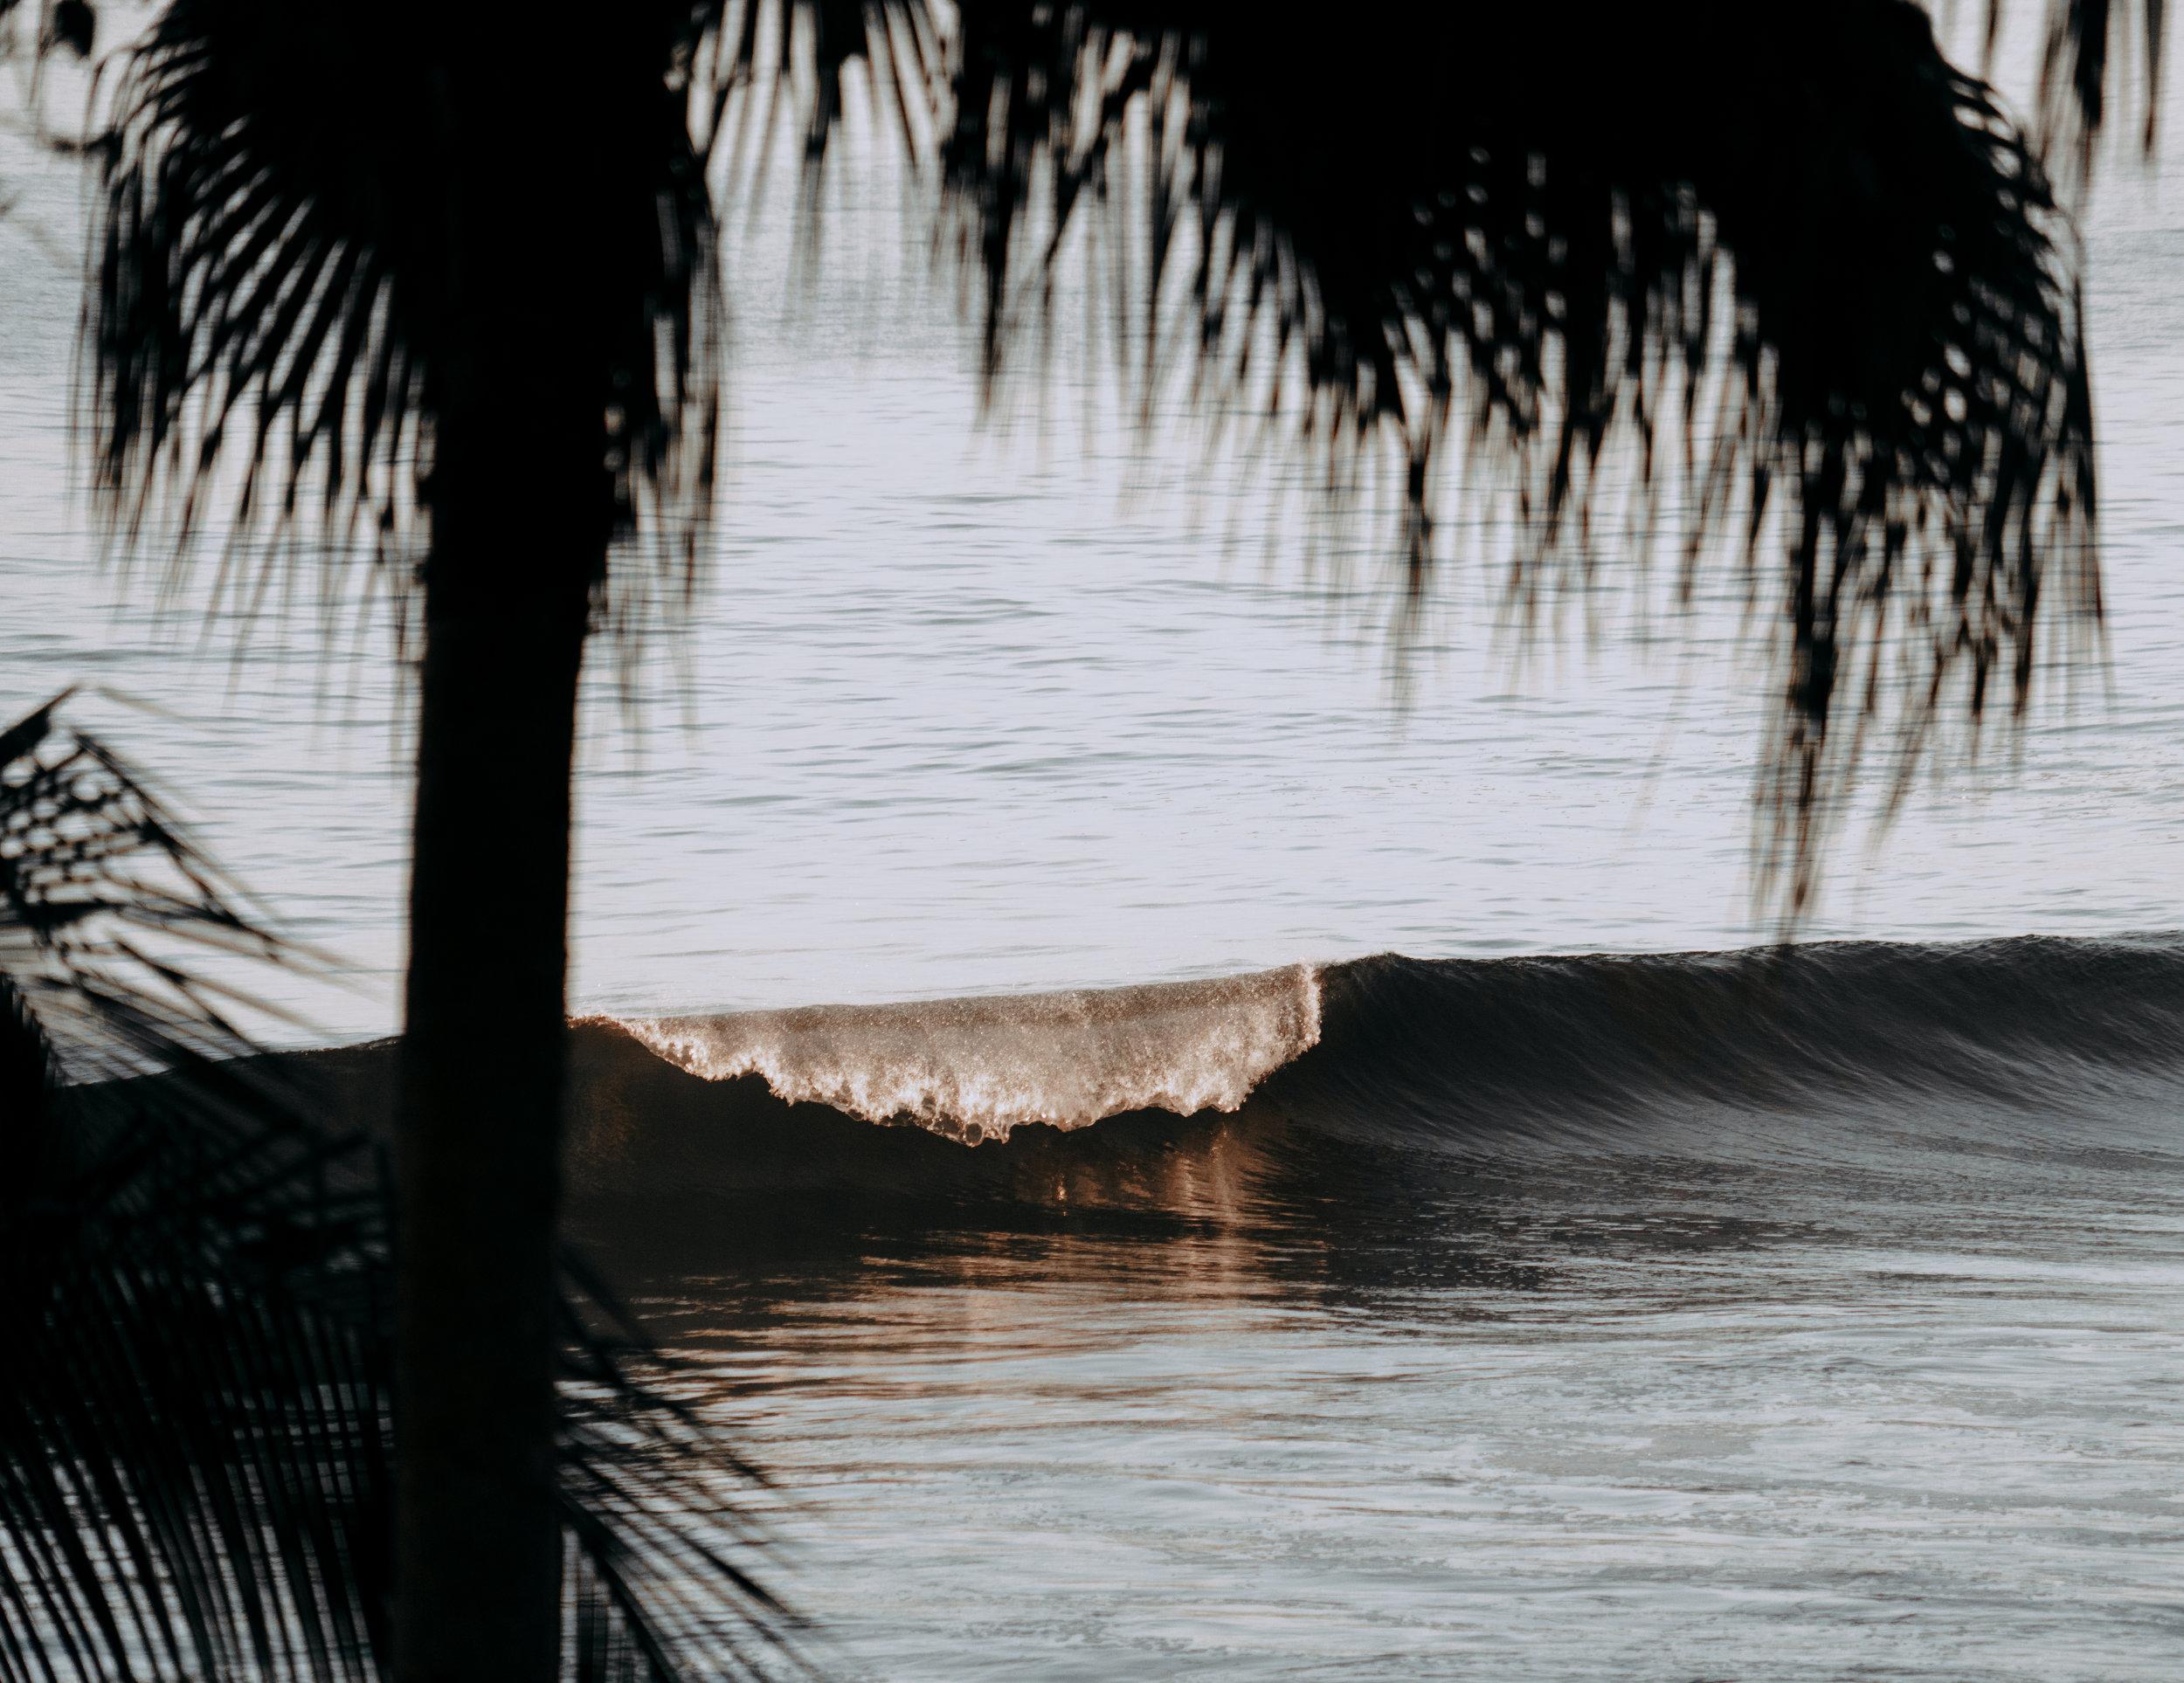 salt water_octavio_coutino 2